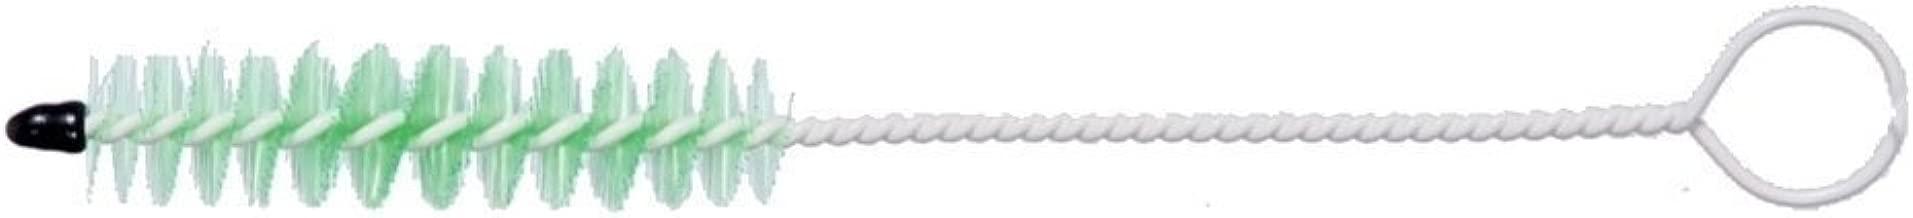 GEWA 757100 - Escobilla para boquillas trombón